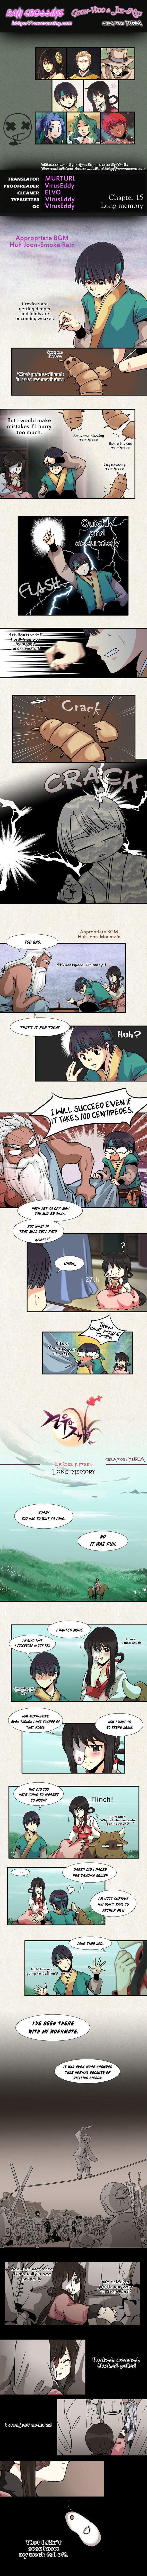 Gyon Woo Jik Nyu 15 Page 1